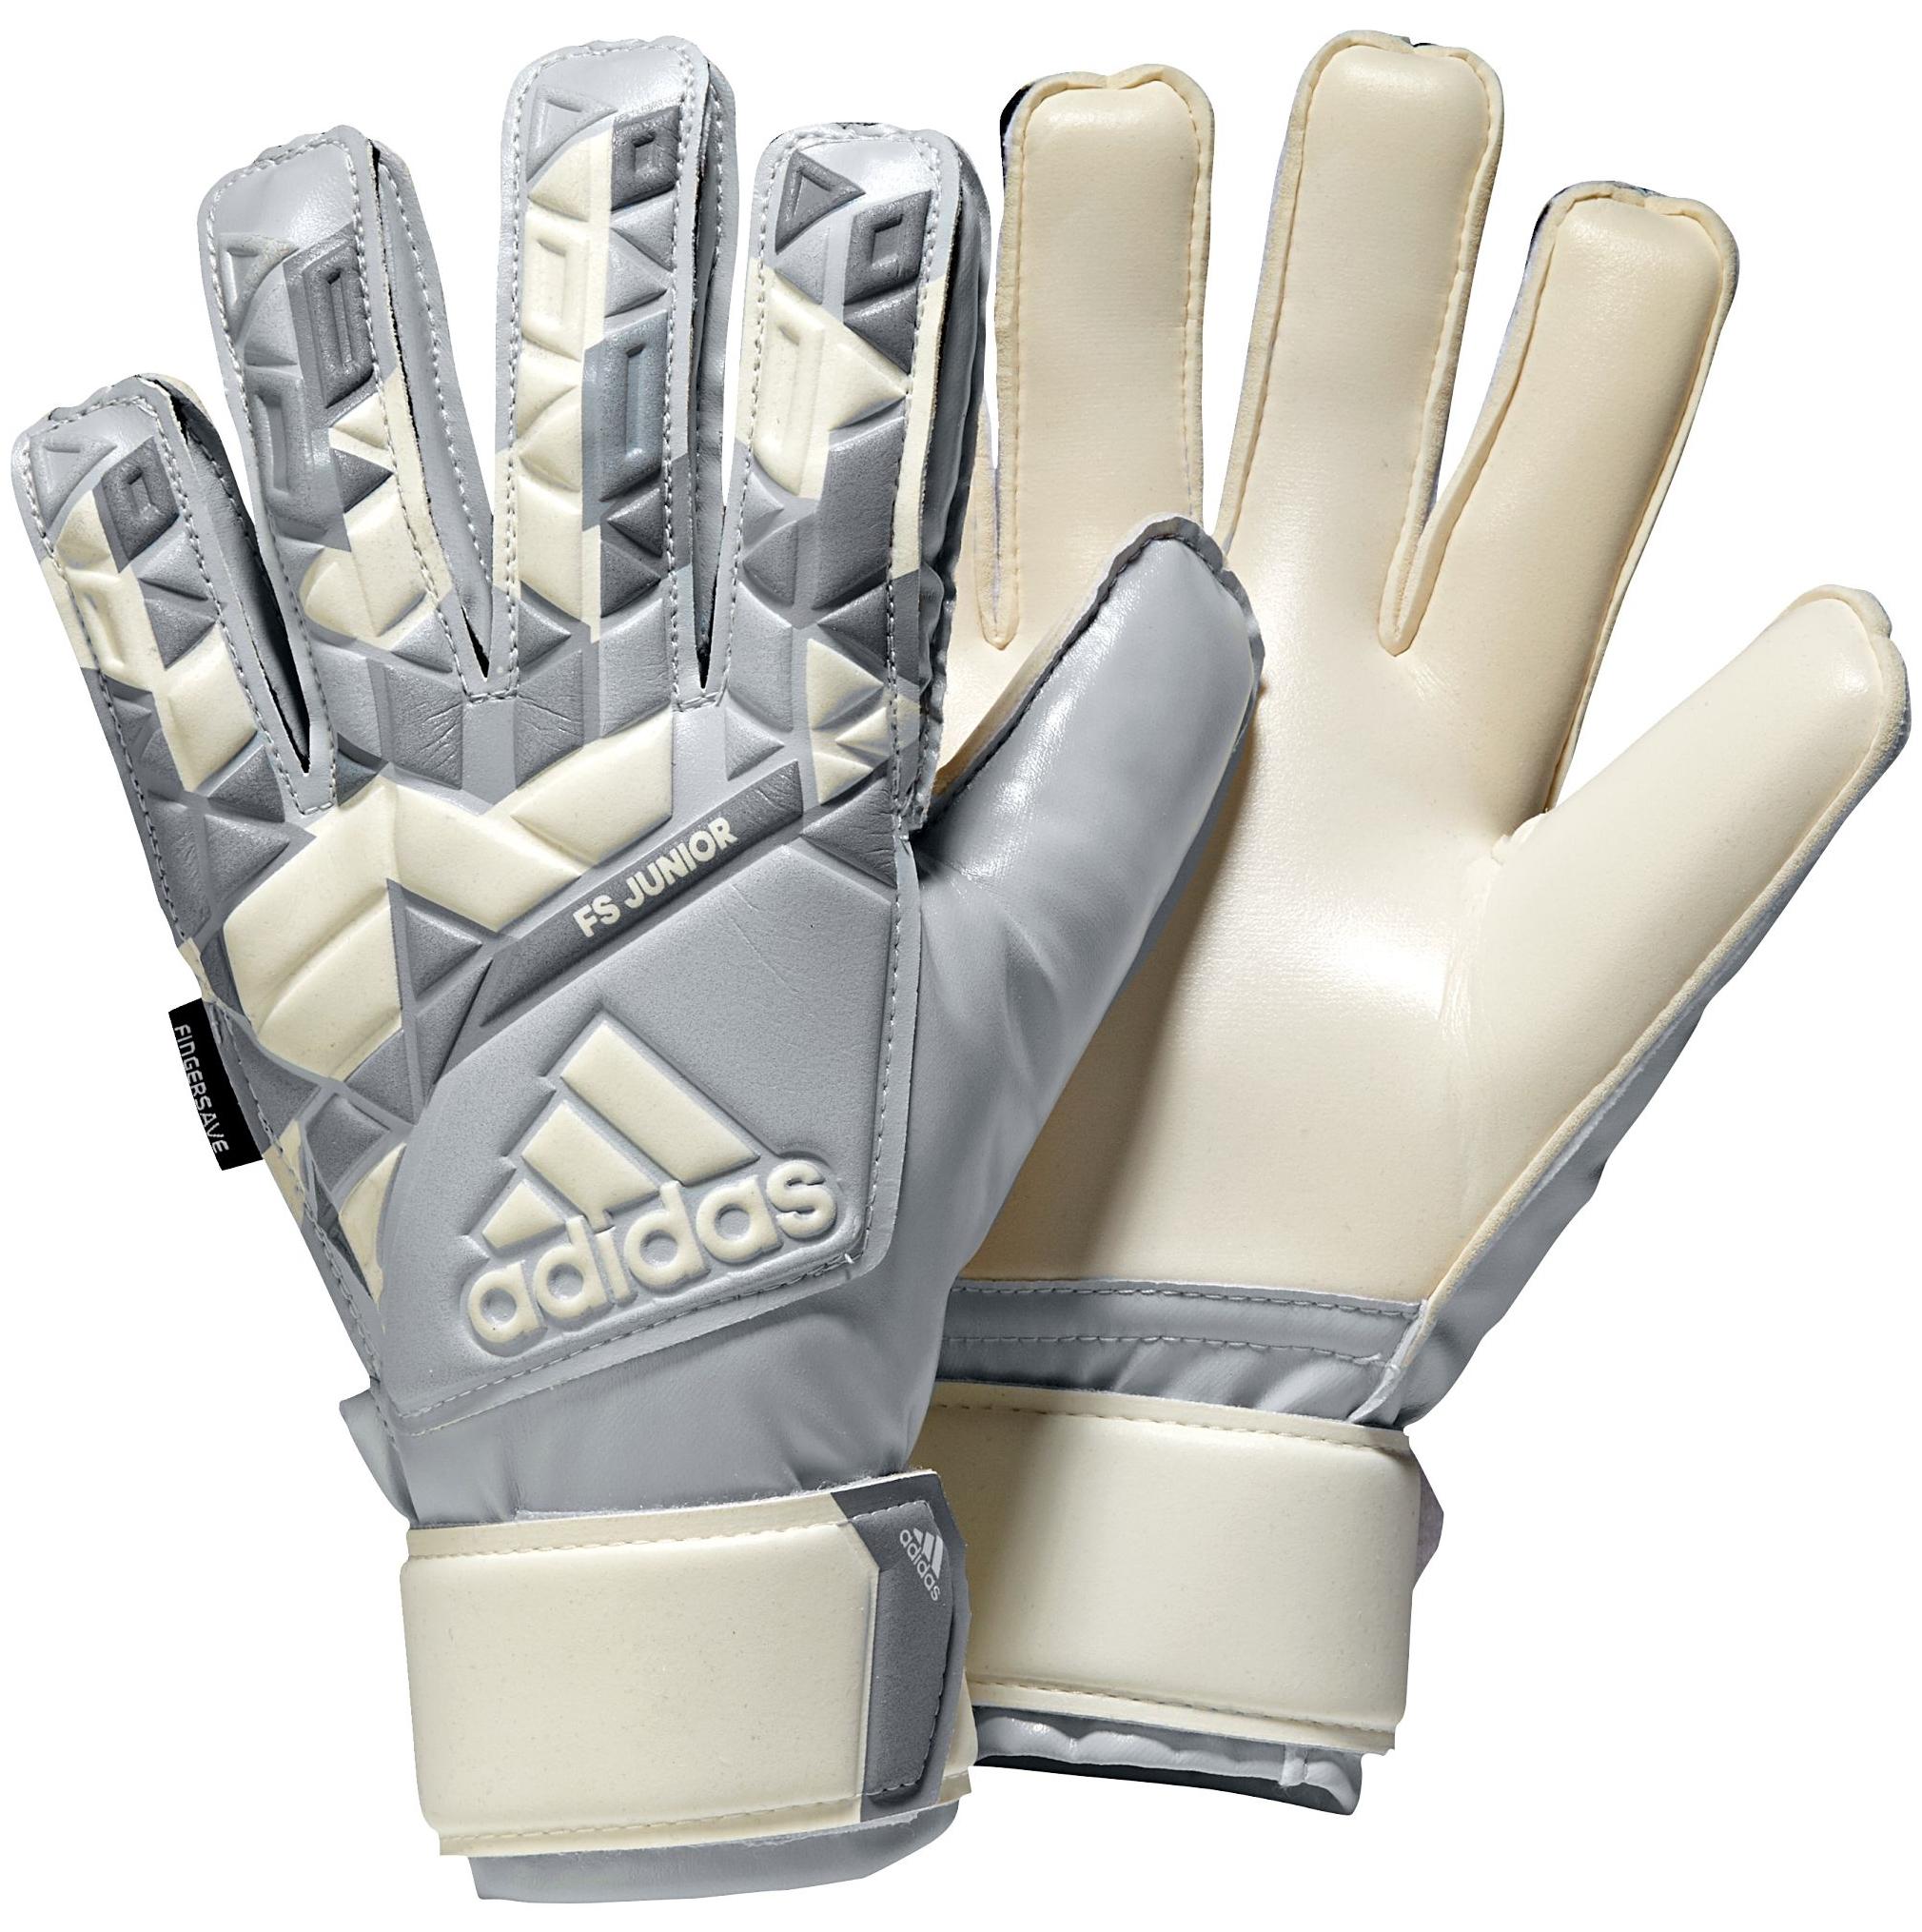 adidas Youth Ace Fingersave Junior Soccer Goalie Gloves